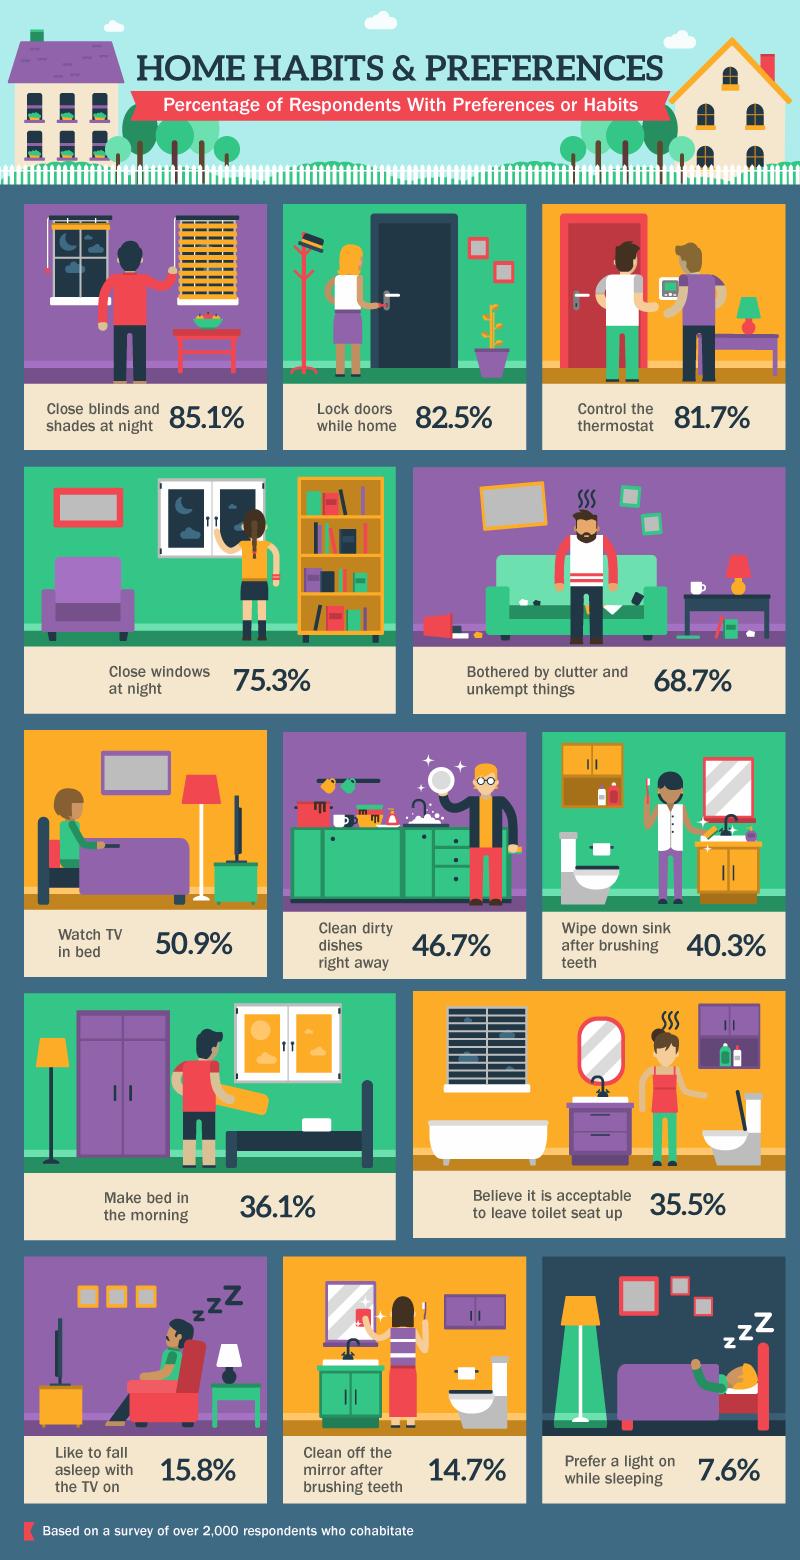 Home Habits Percentages